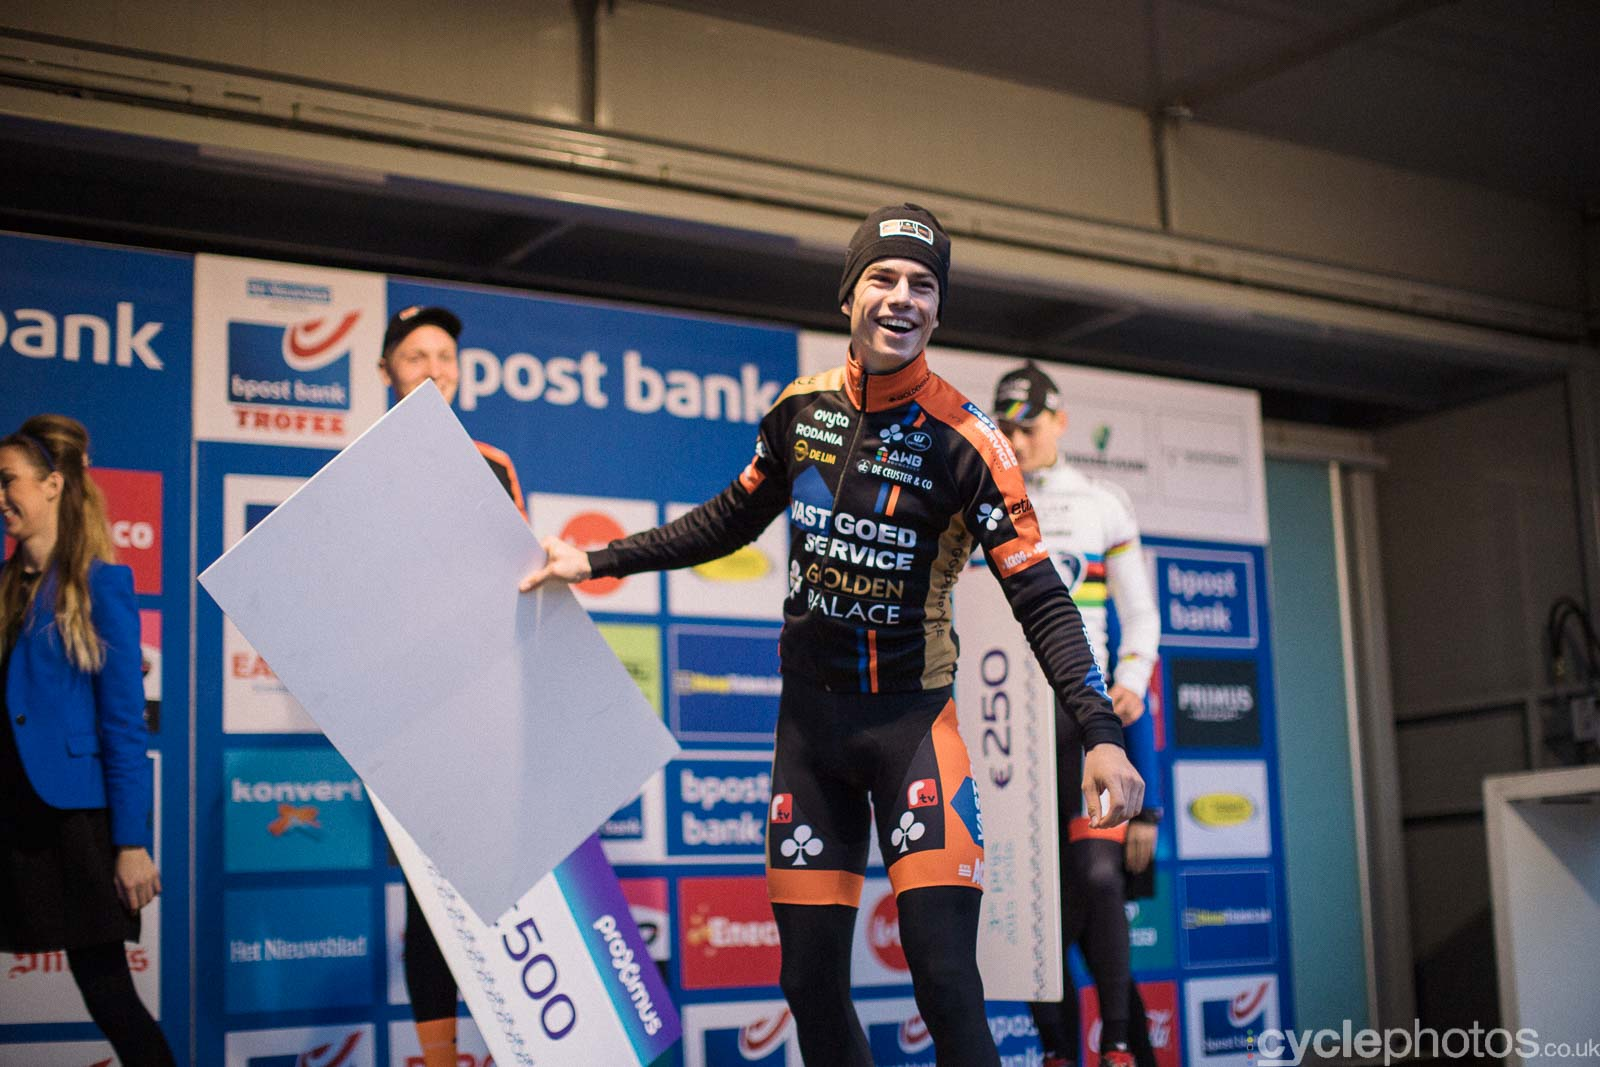 2015-cyclephotos-cyclocross-azencross-161819-wout-van-aert